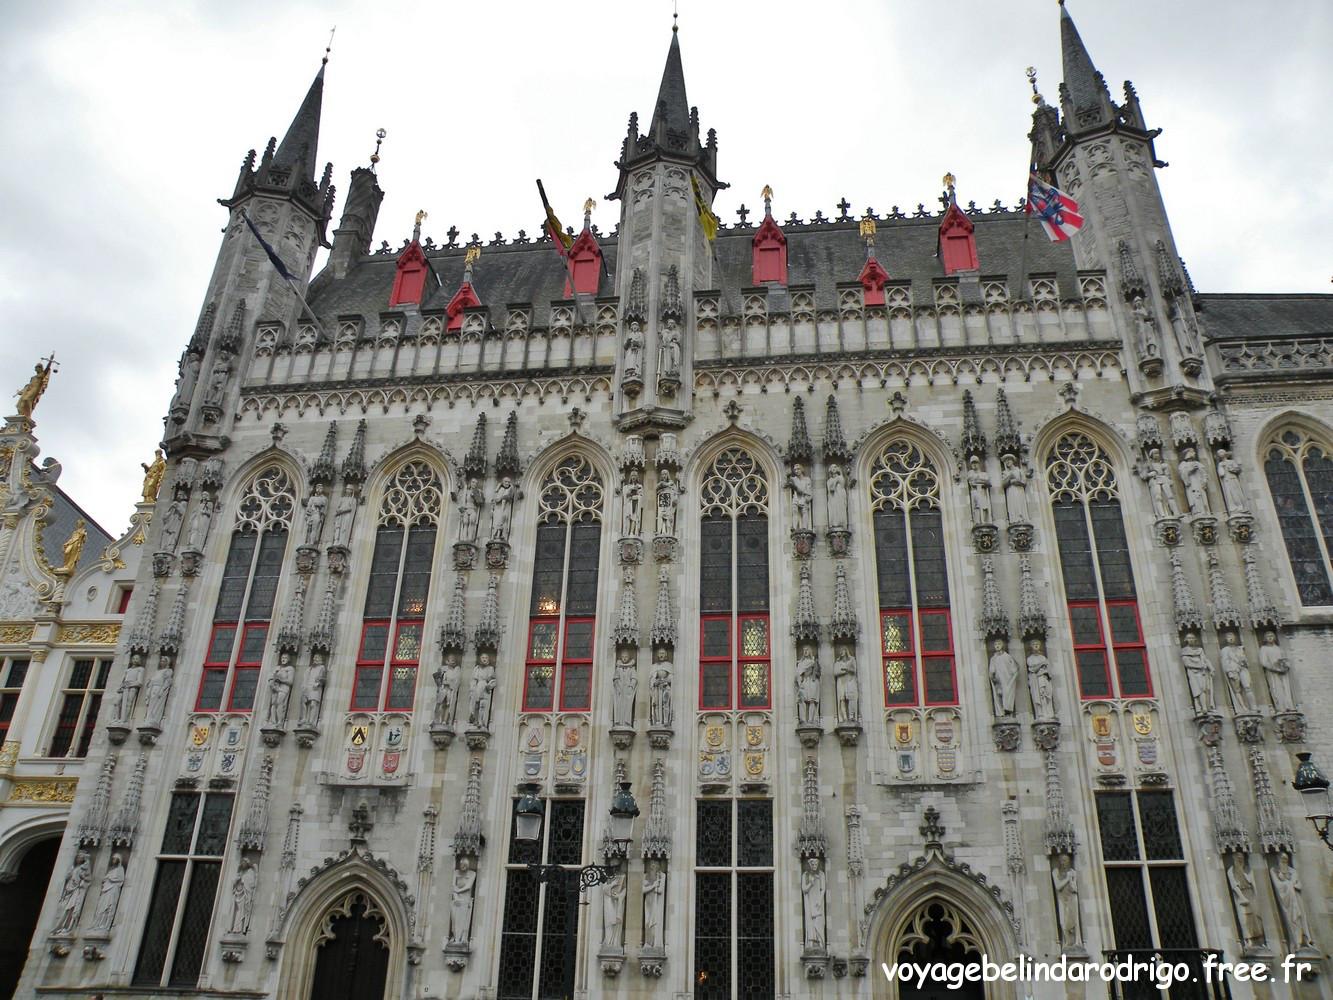 Hôtel de Ville - Place du Burg - Bruges